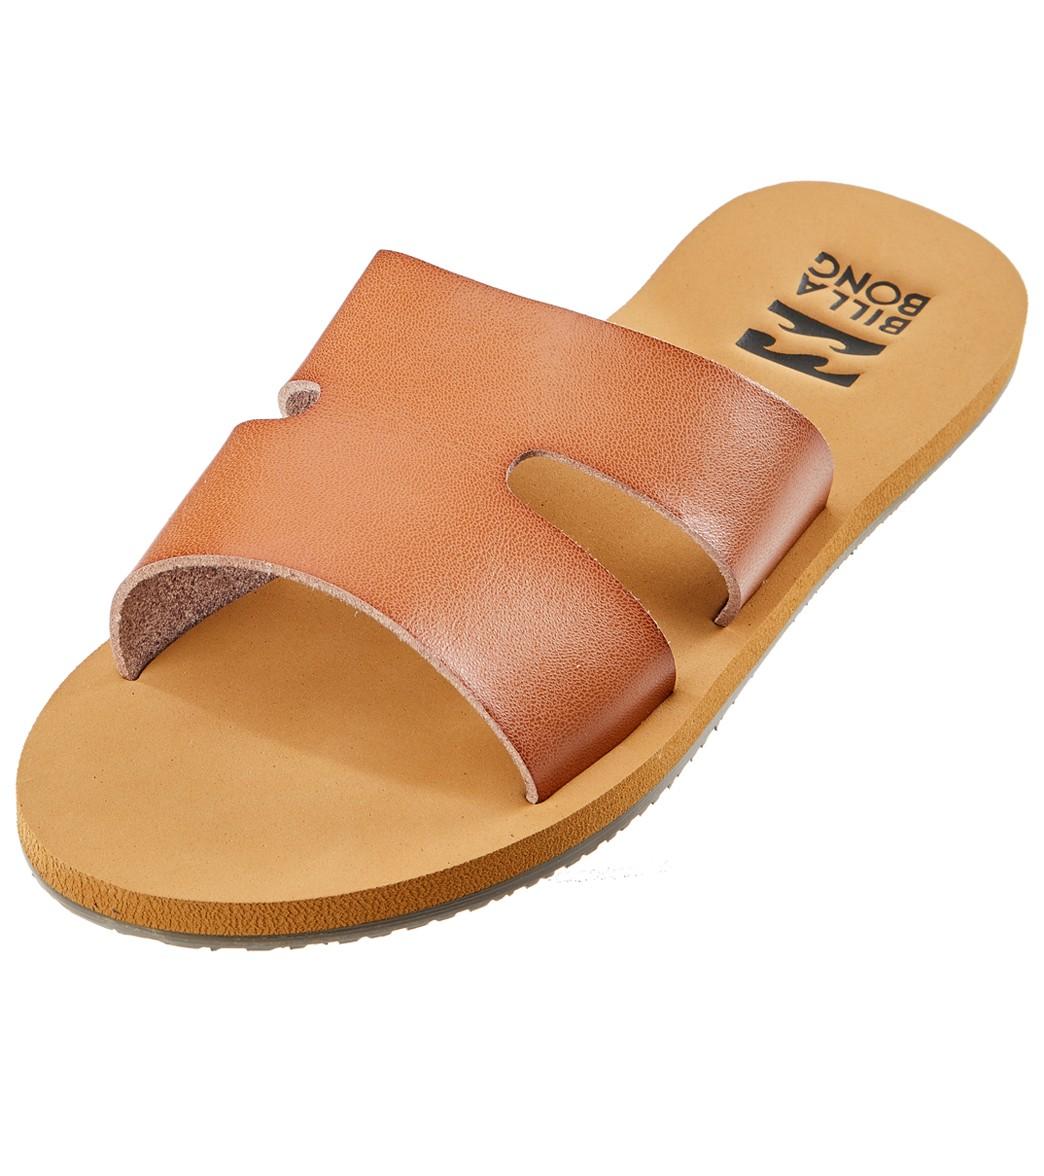 7ed7d5c6d Billabong Women s Wander Often Leather Slide Sandal at SwimOutlet.com